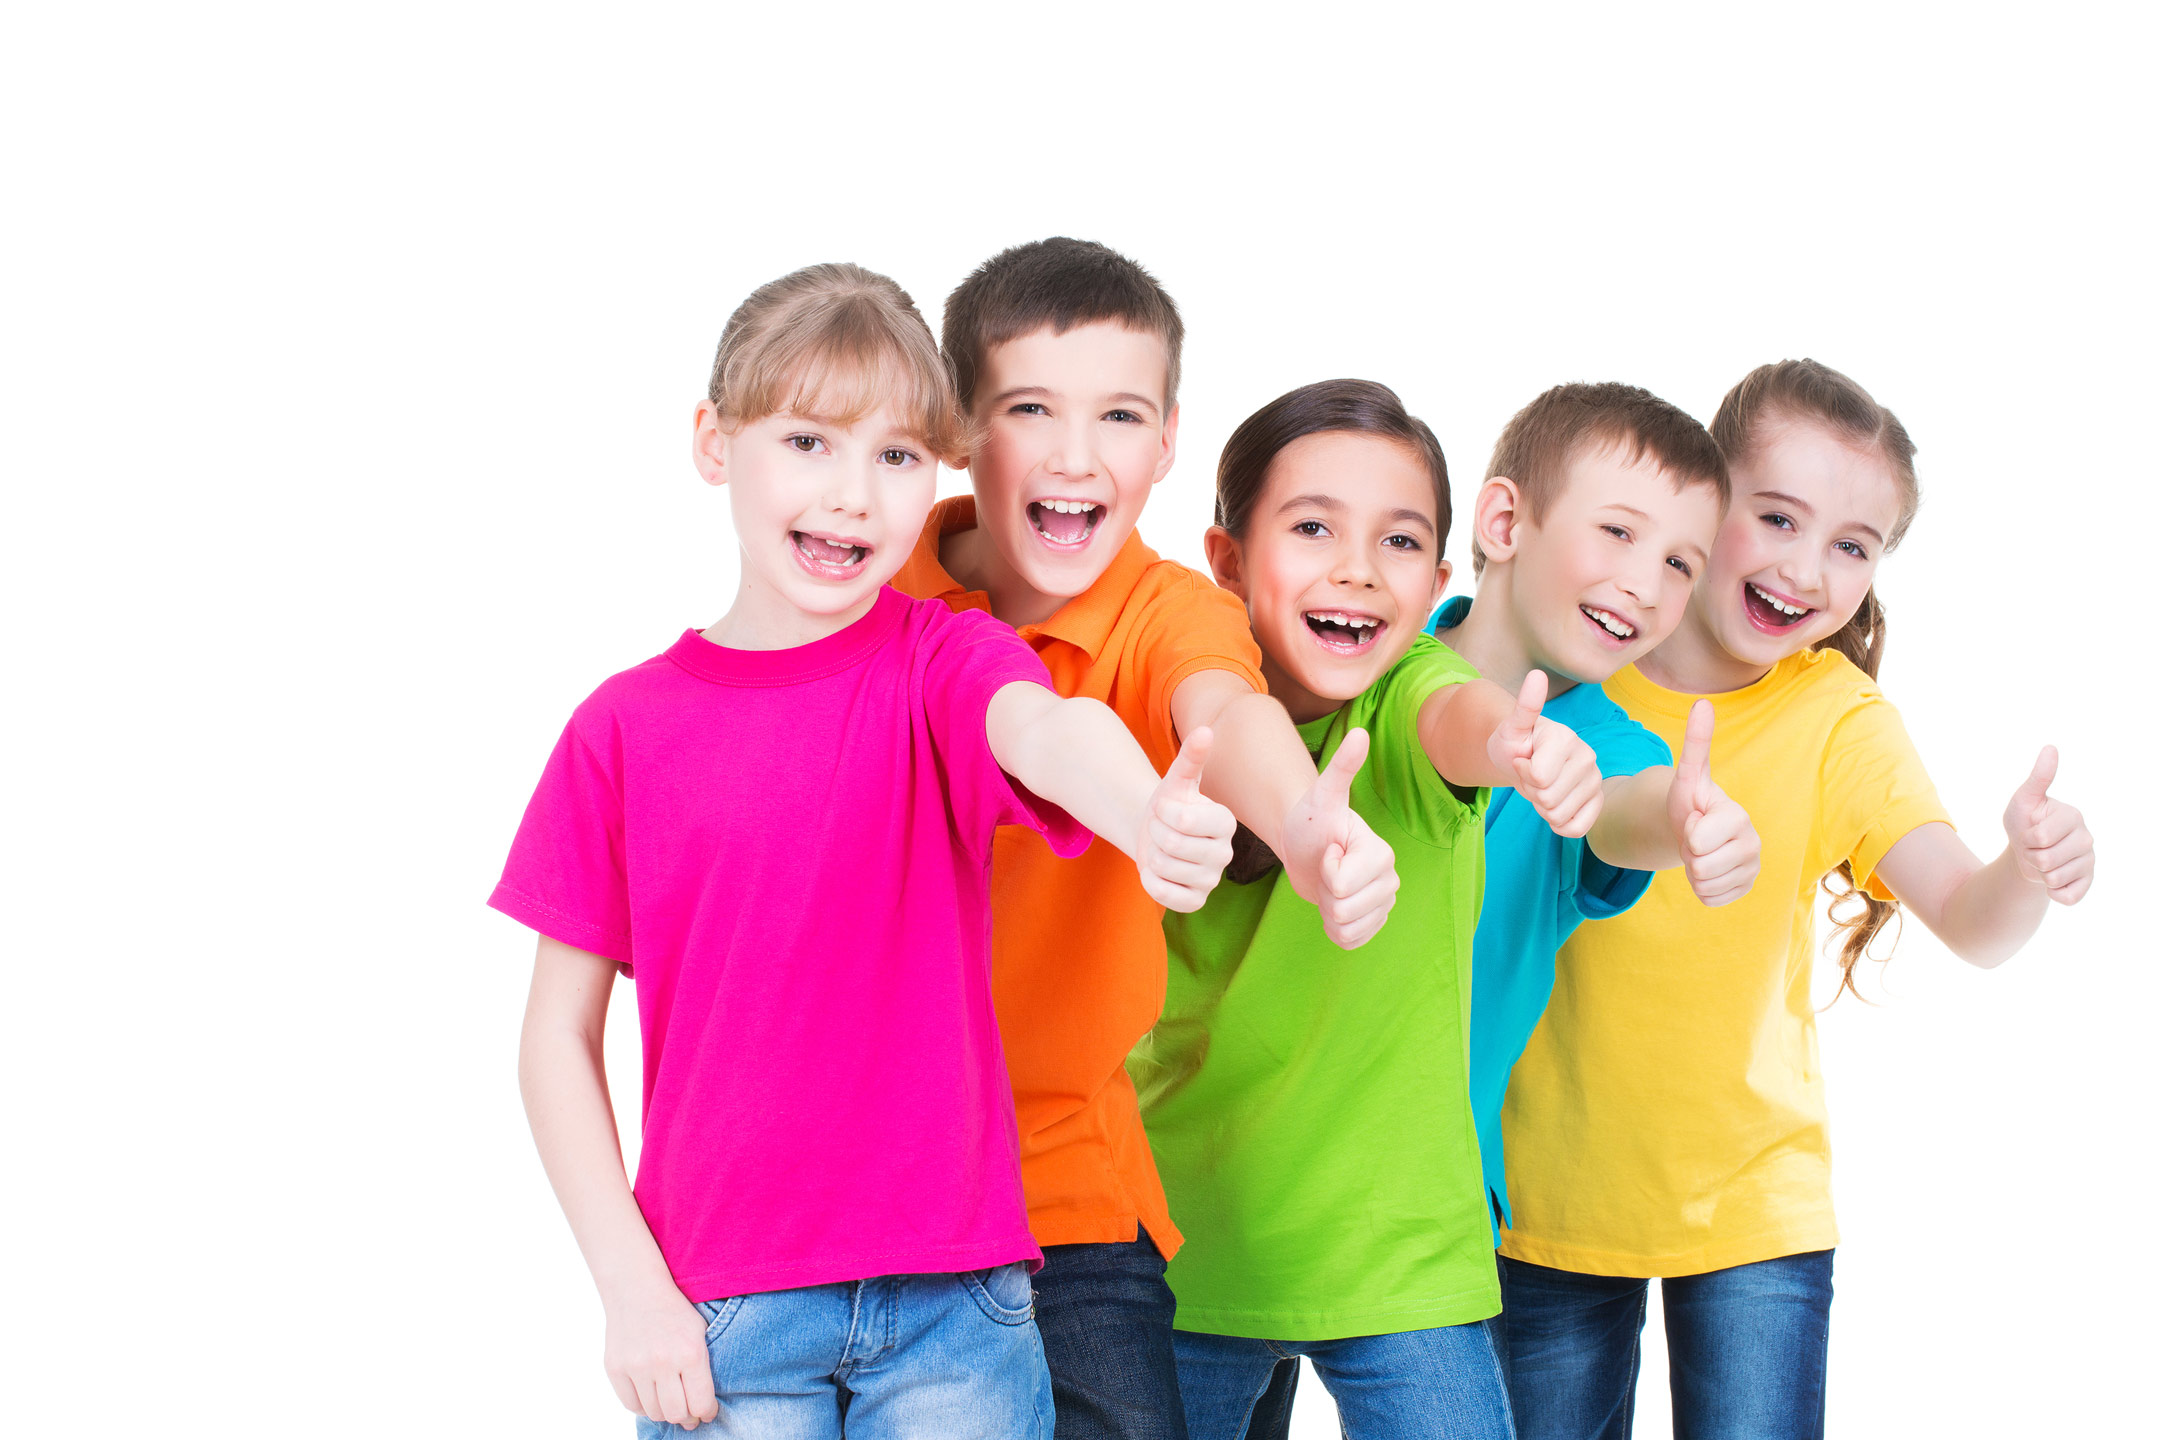 happy-kids-thumbs-up2160